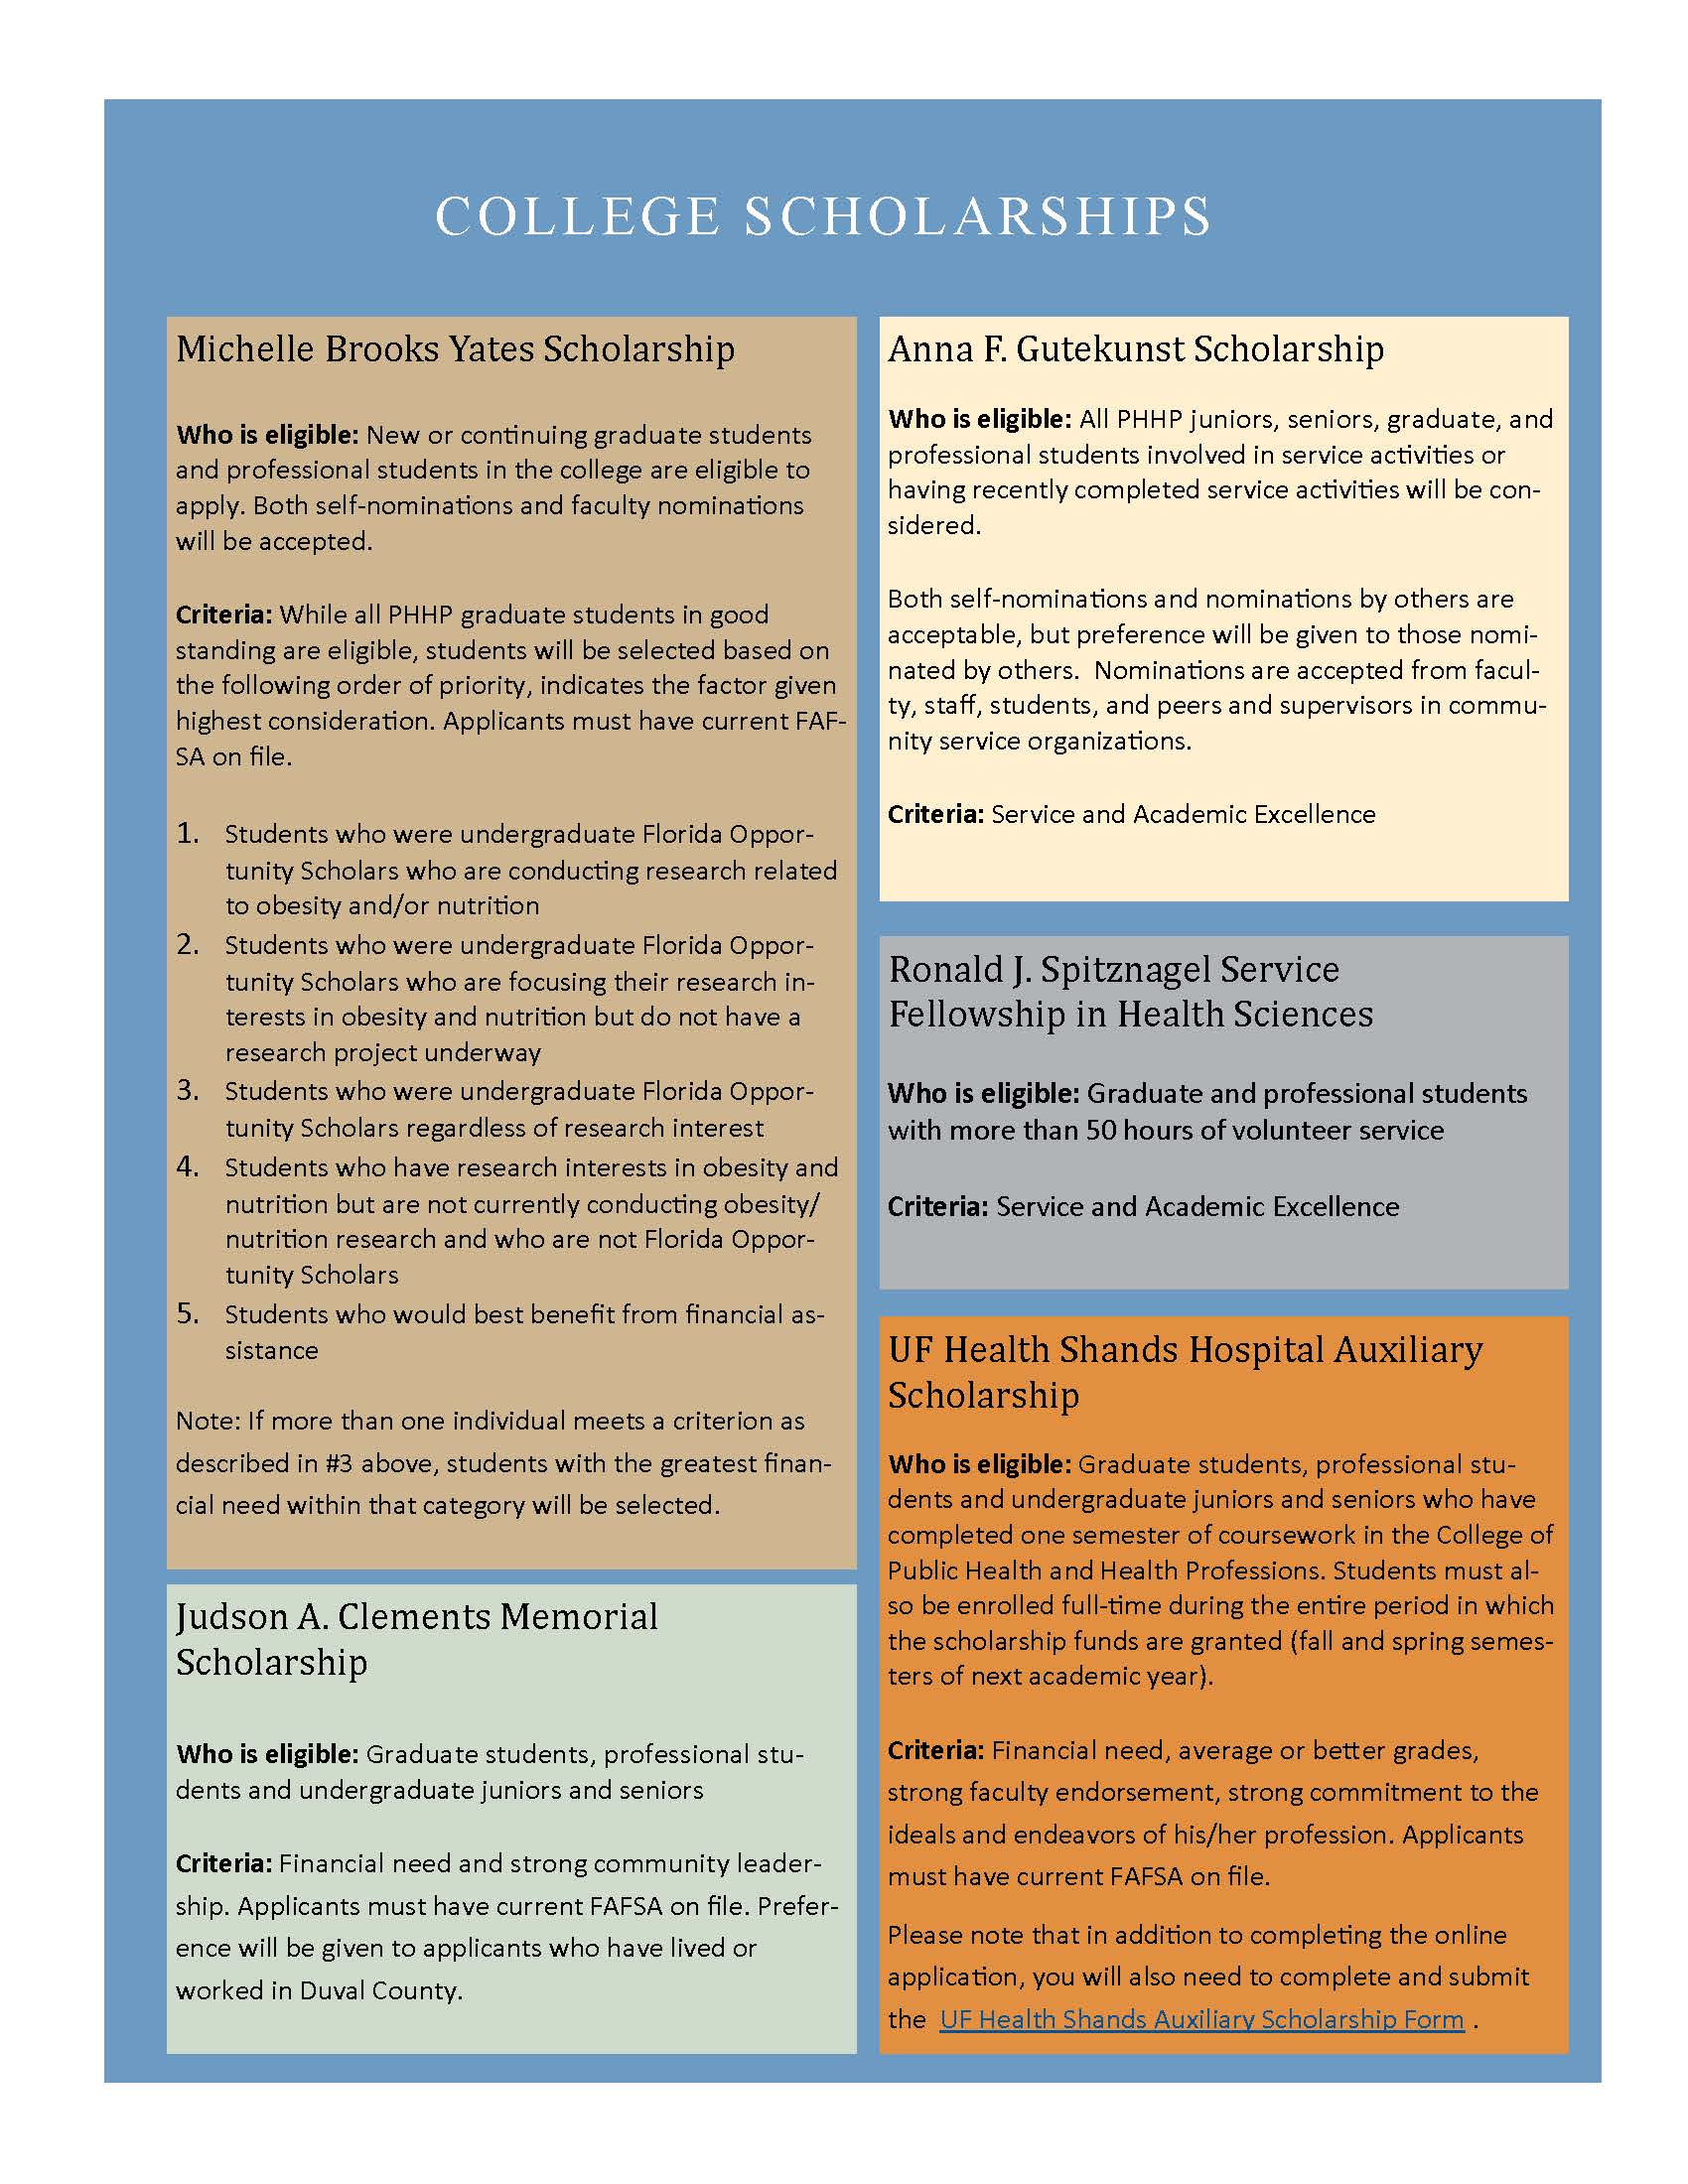 Scholarship List